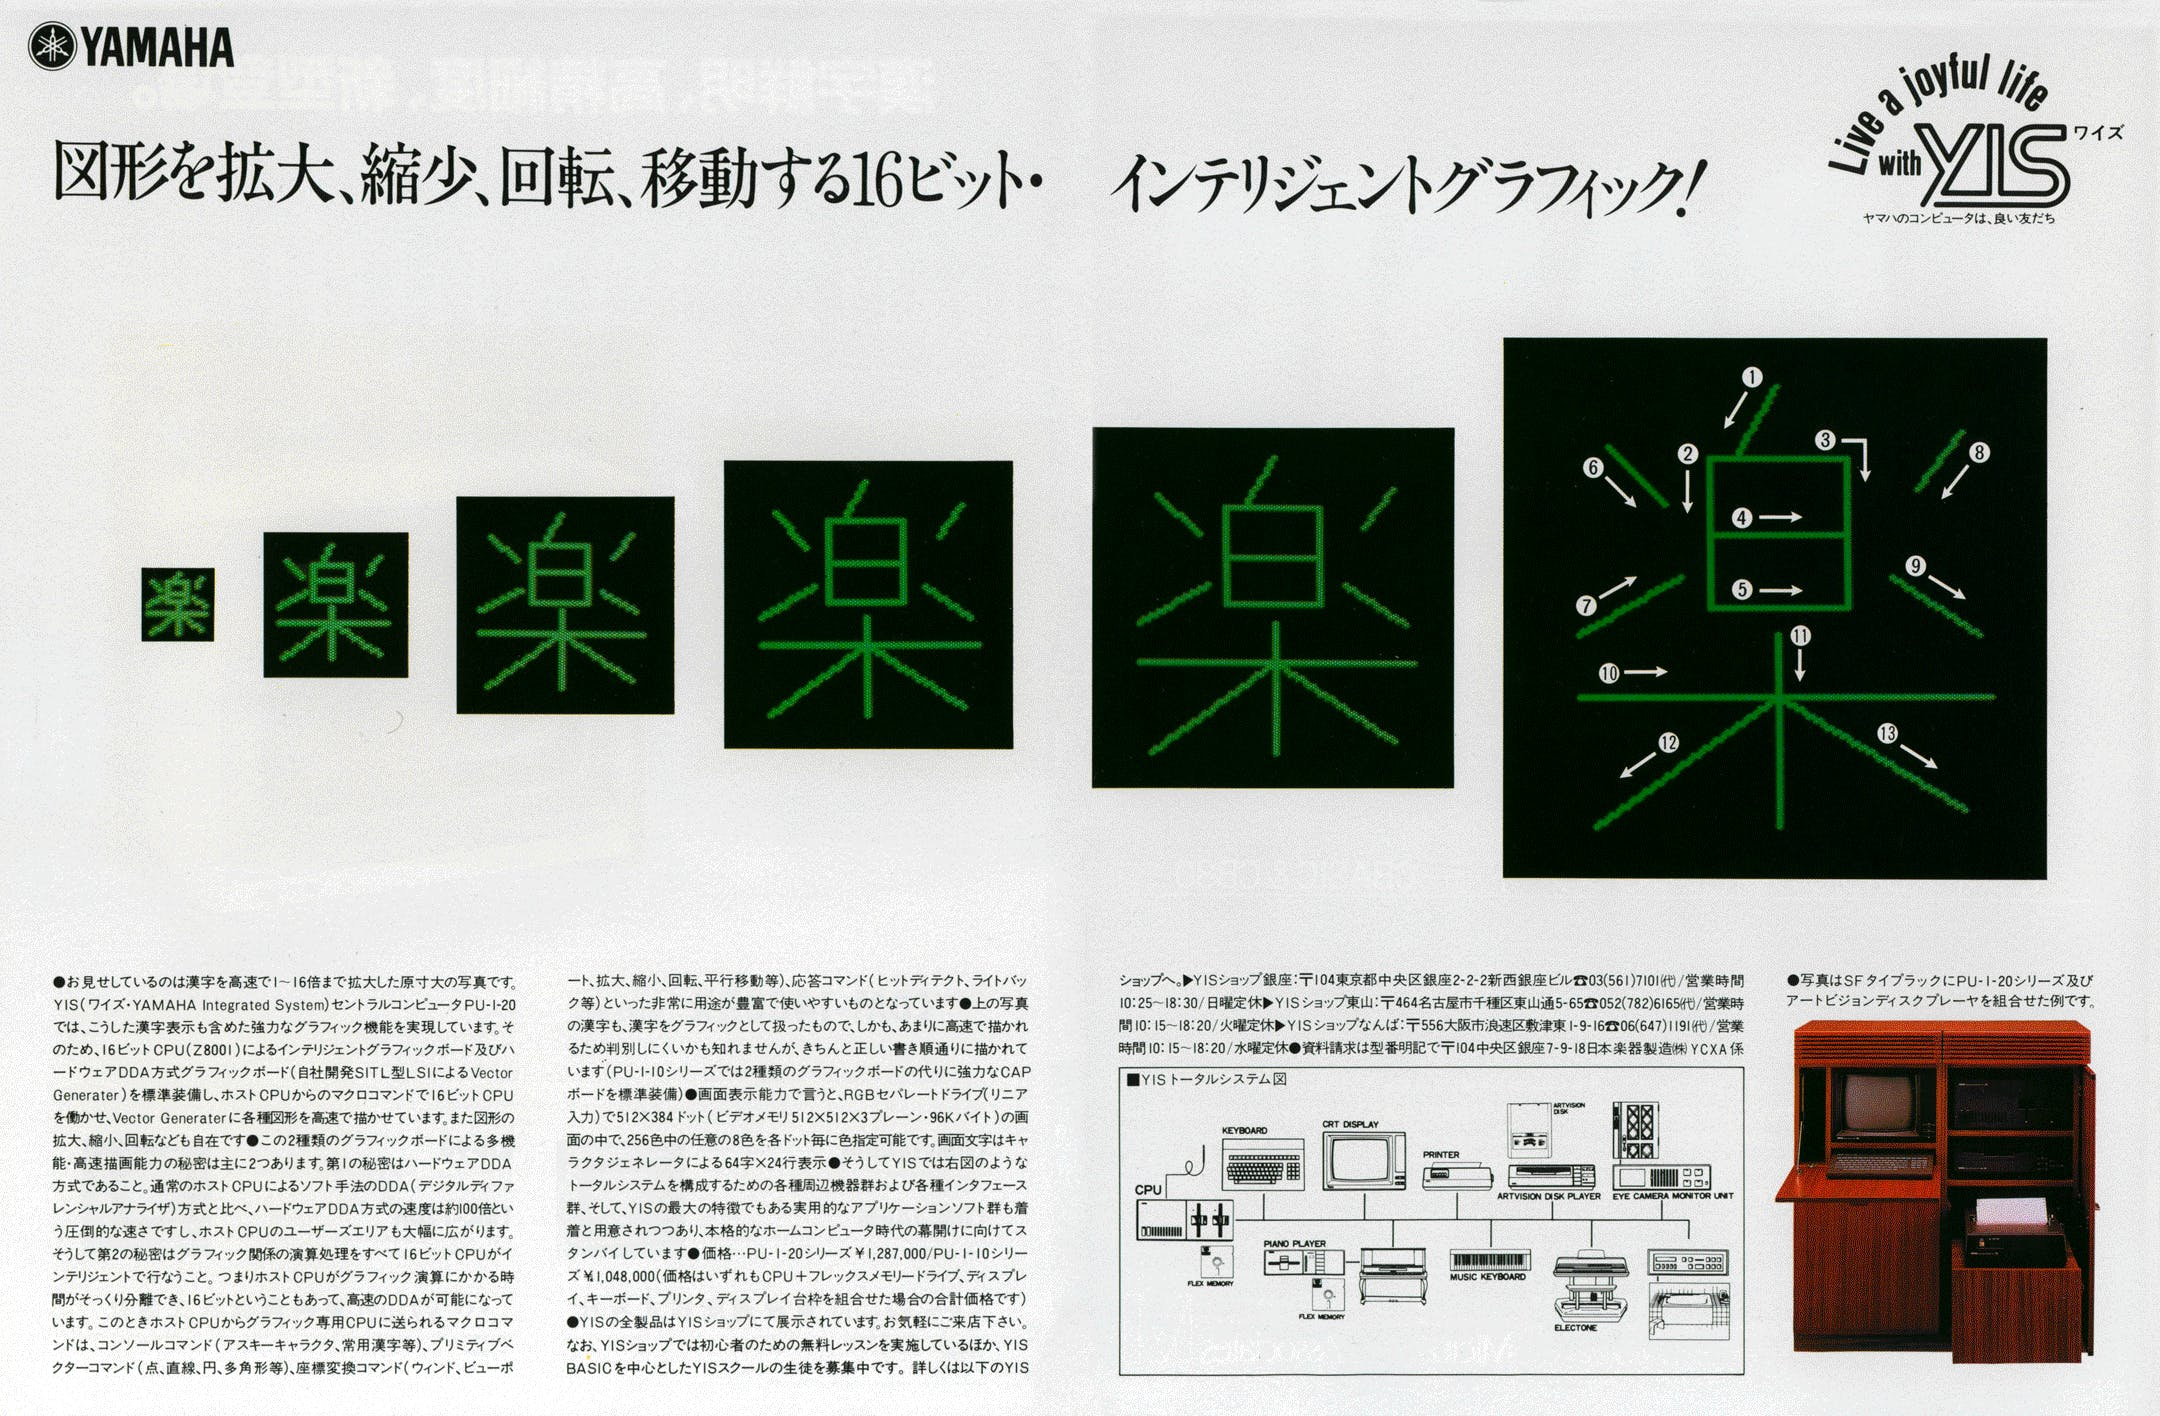 Yamaha YIS advertisement ASCII japan 4 1982